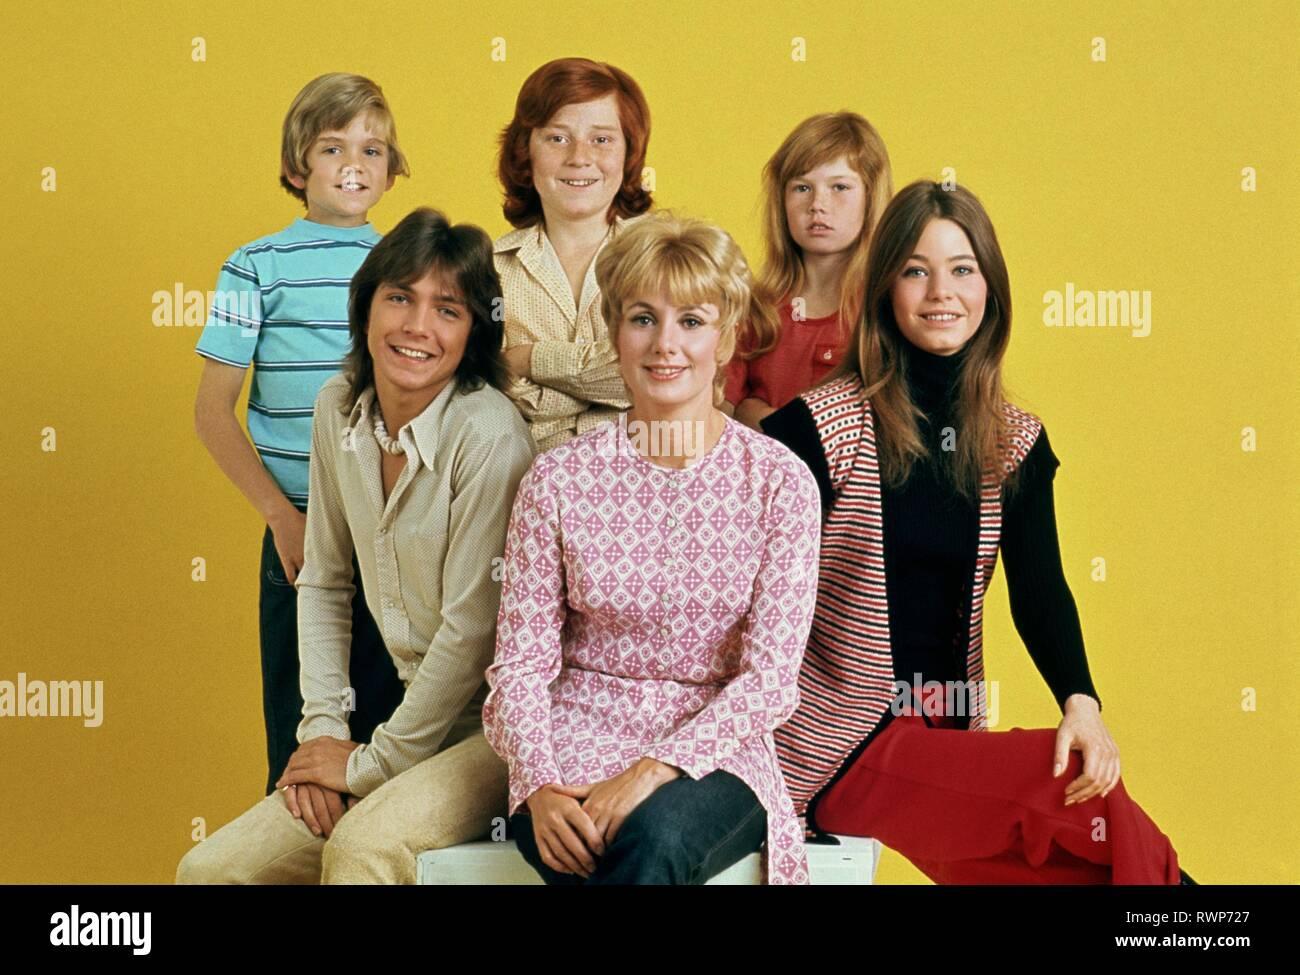 BRIAN FORSTER, DAVID CASSIDY, DANNY BONADUCE, SHIRLEY JONES, SUZANNE CROUGH,SUSAN DEY, THE PARTRIDGE FAMILY, 1970 - Stock Image